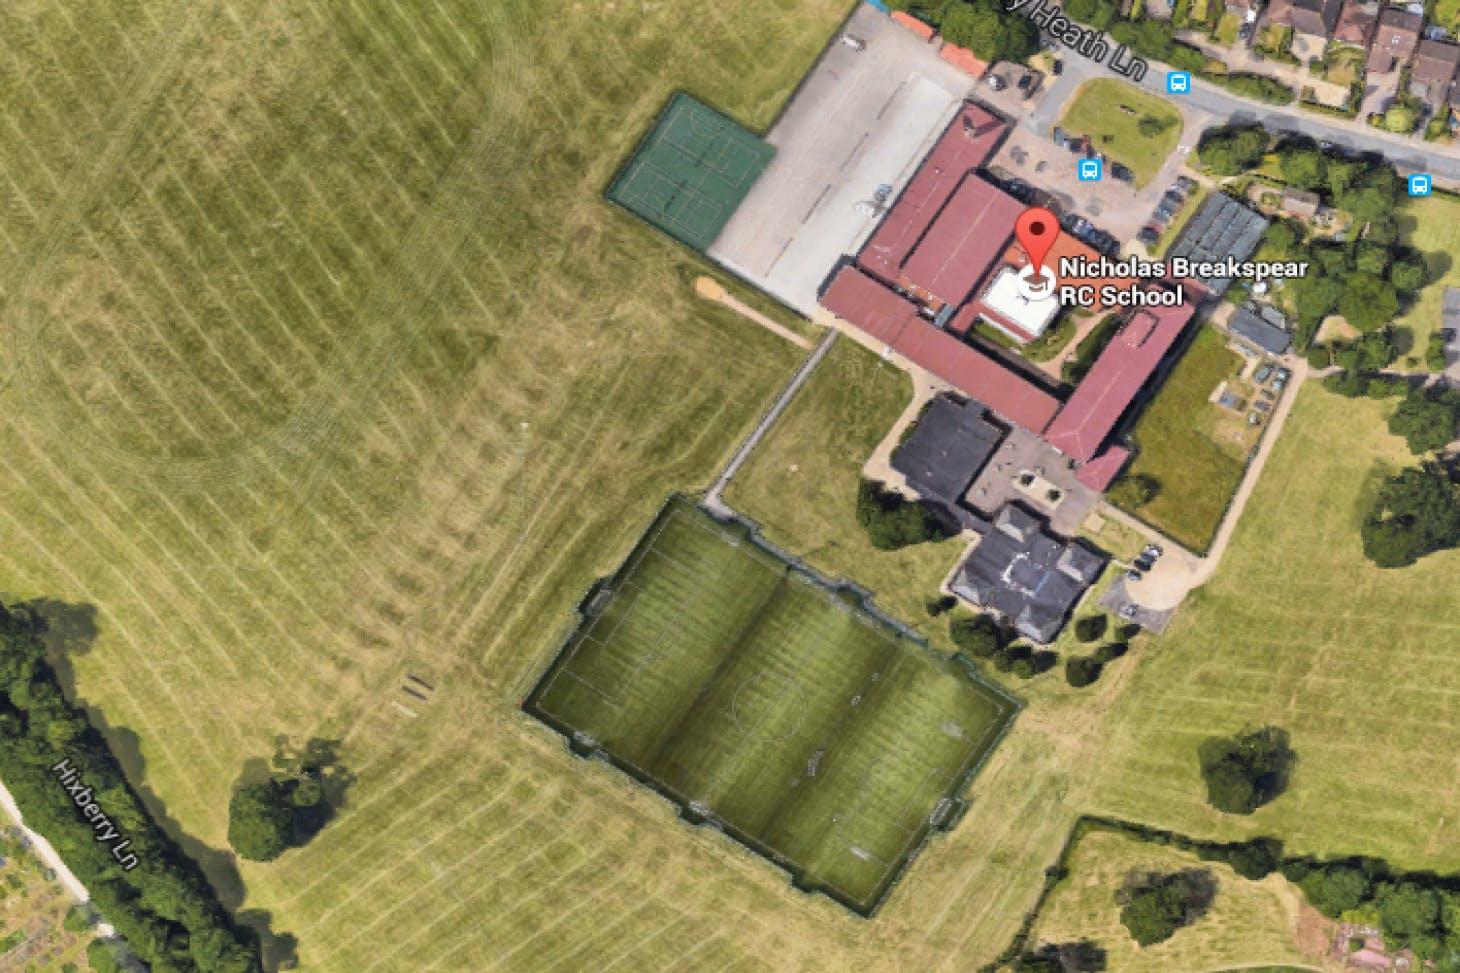 Nicholas Breakspear RC School Outdoor | Astroturf hockey pitch